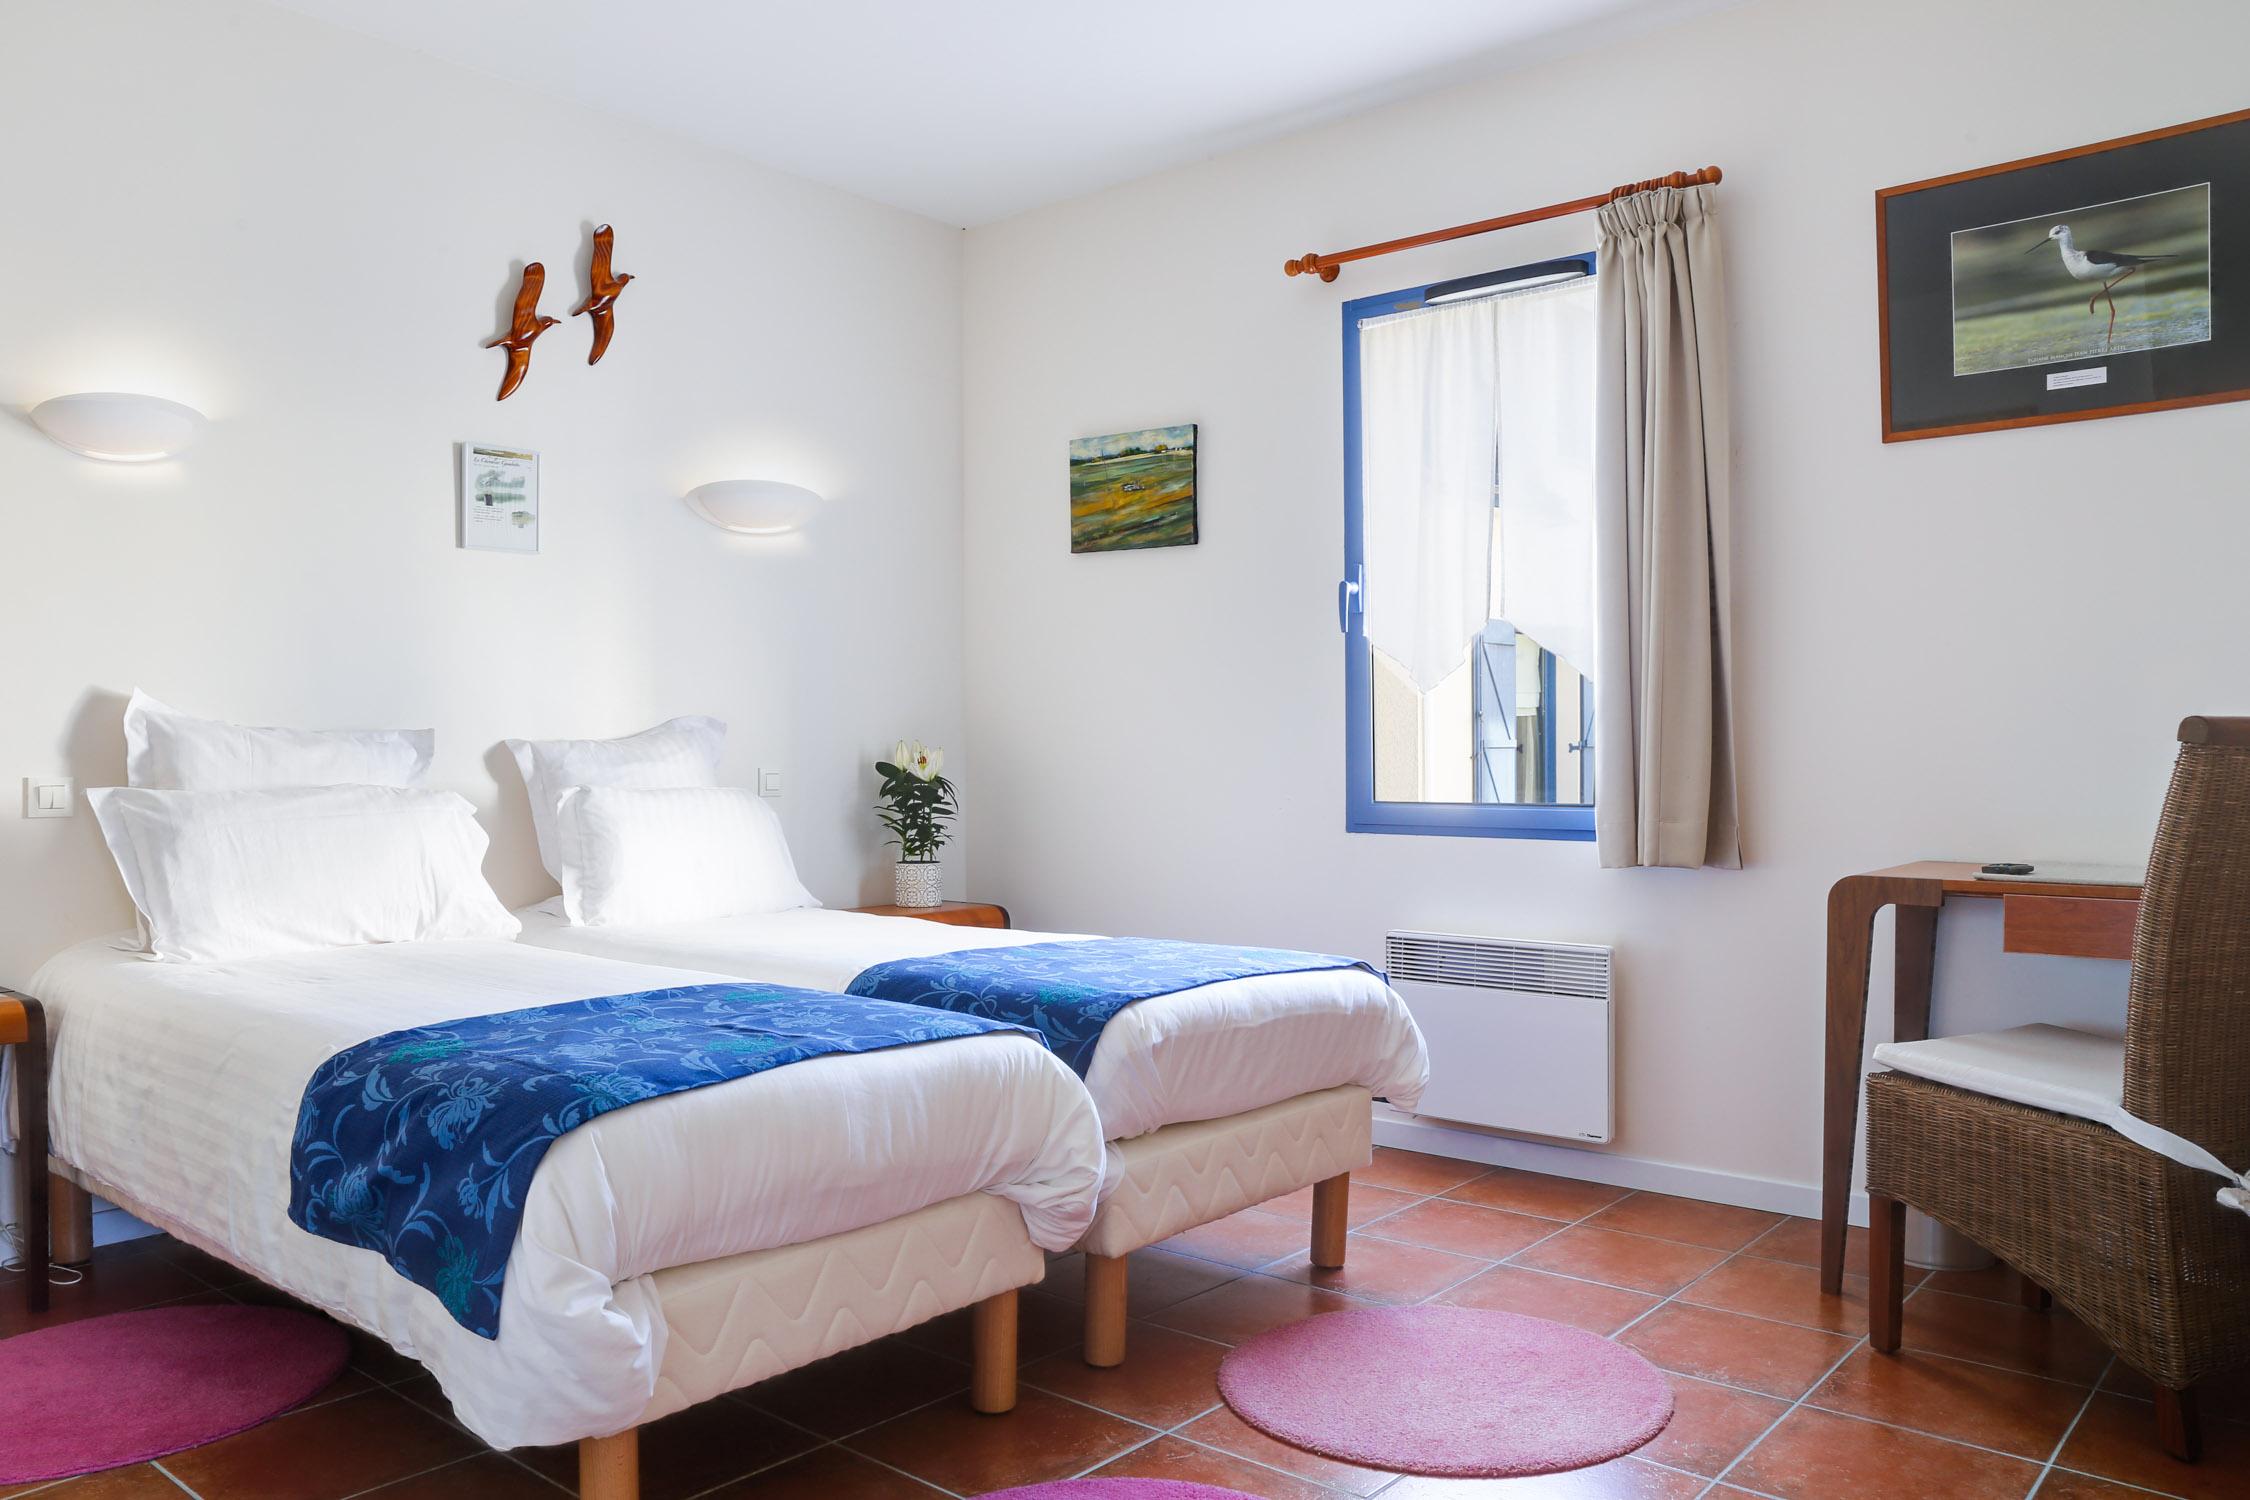 Chambre tout confort standard hotel chevalier gambette - Humidifier l air d une chambre ...